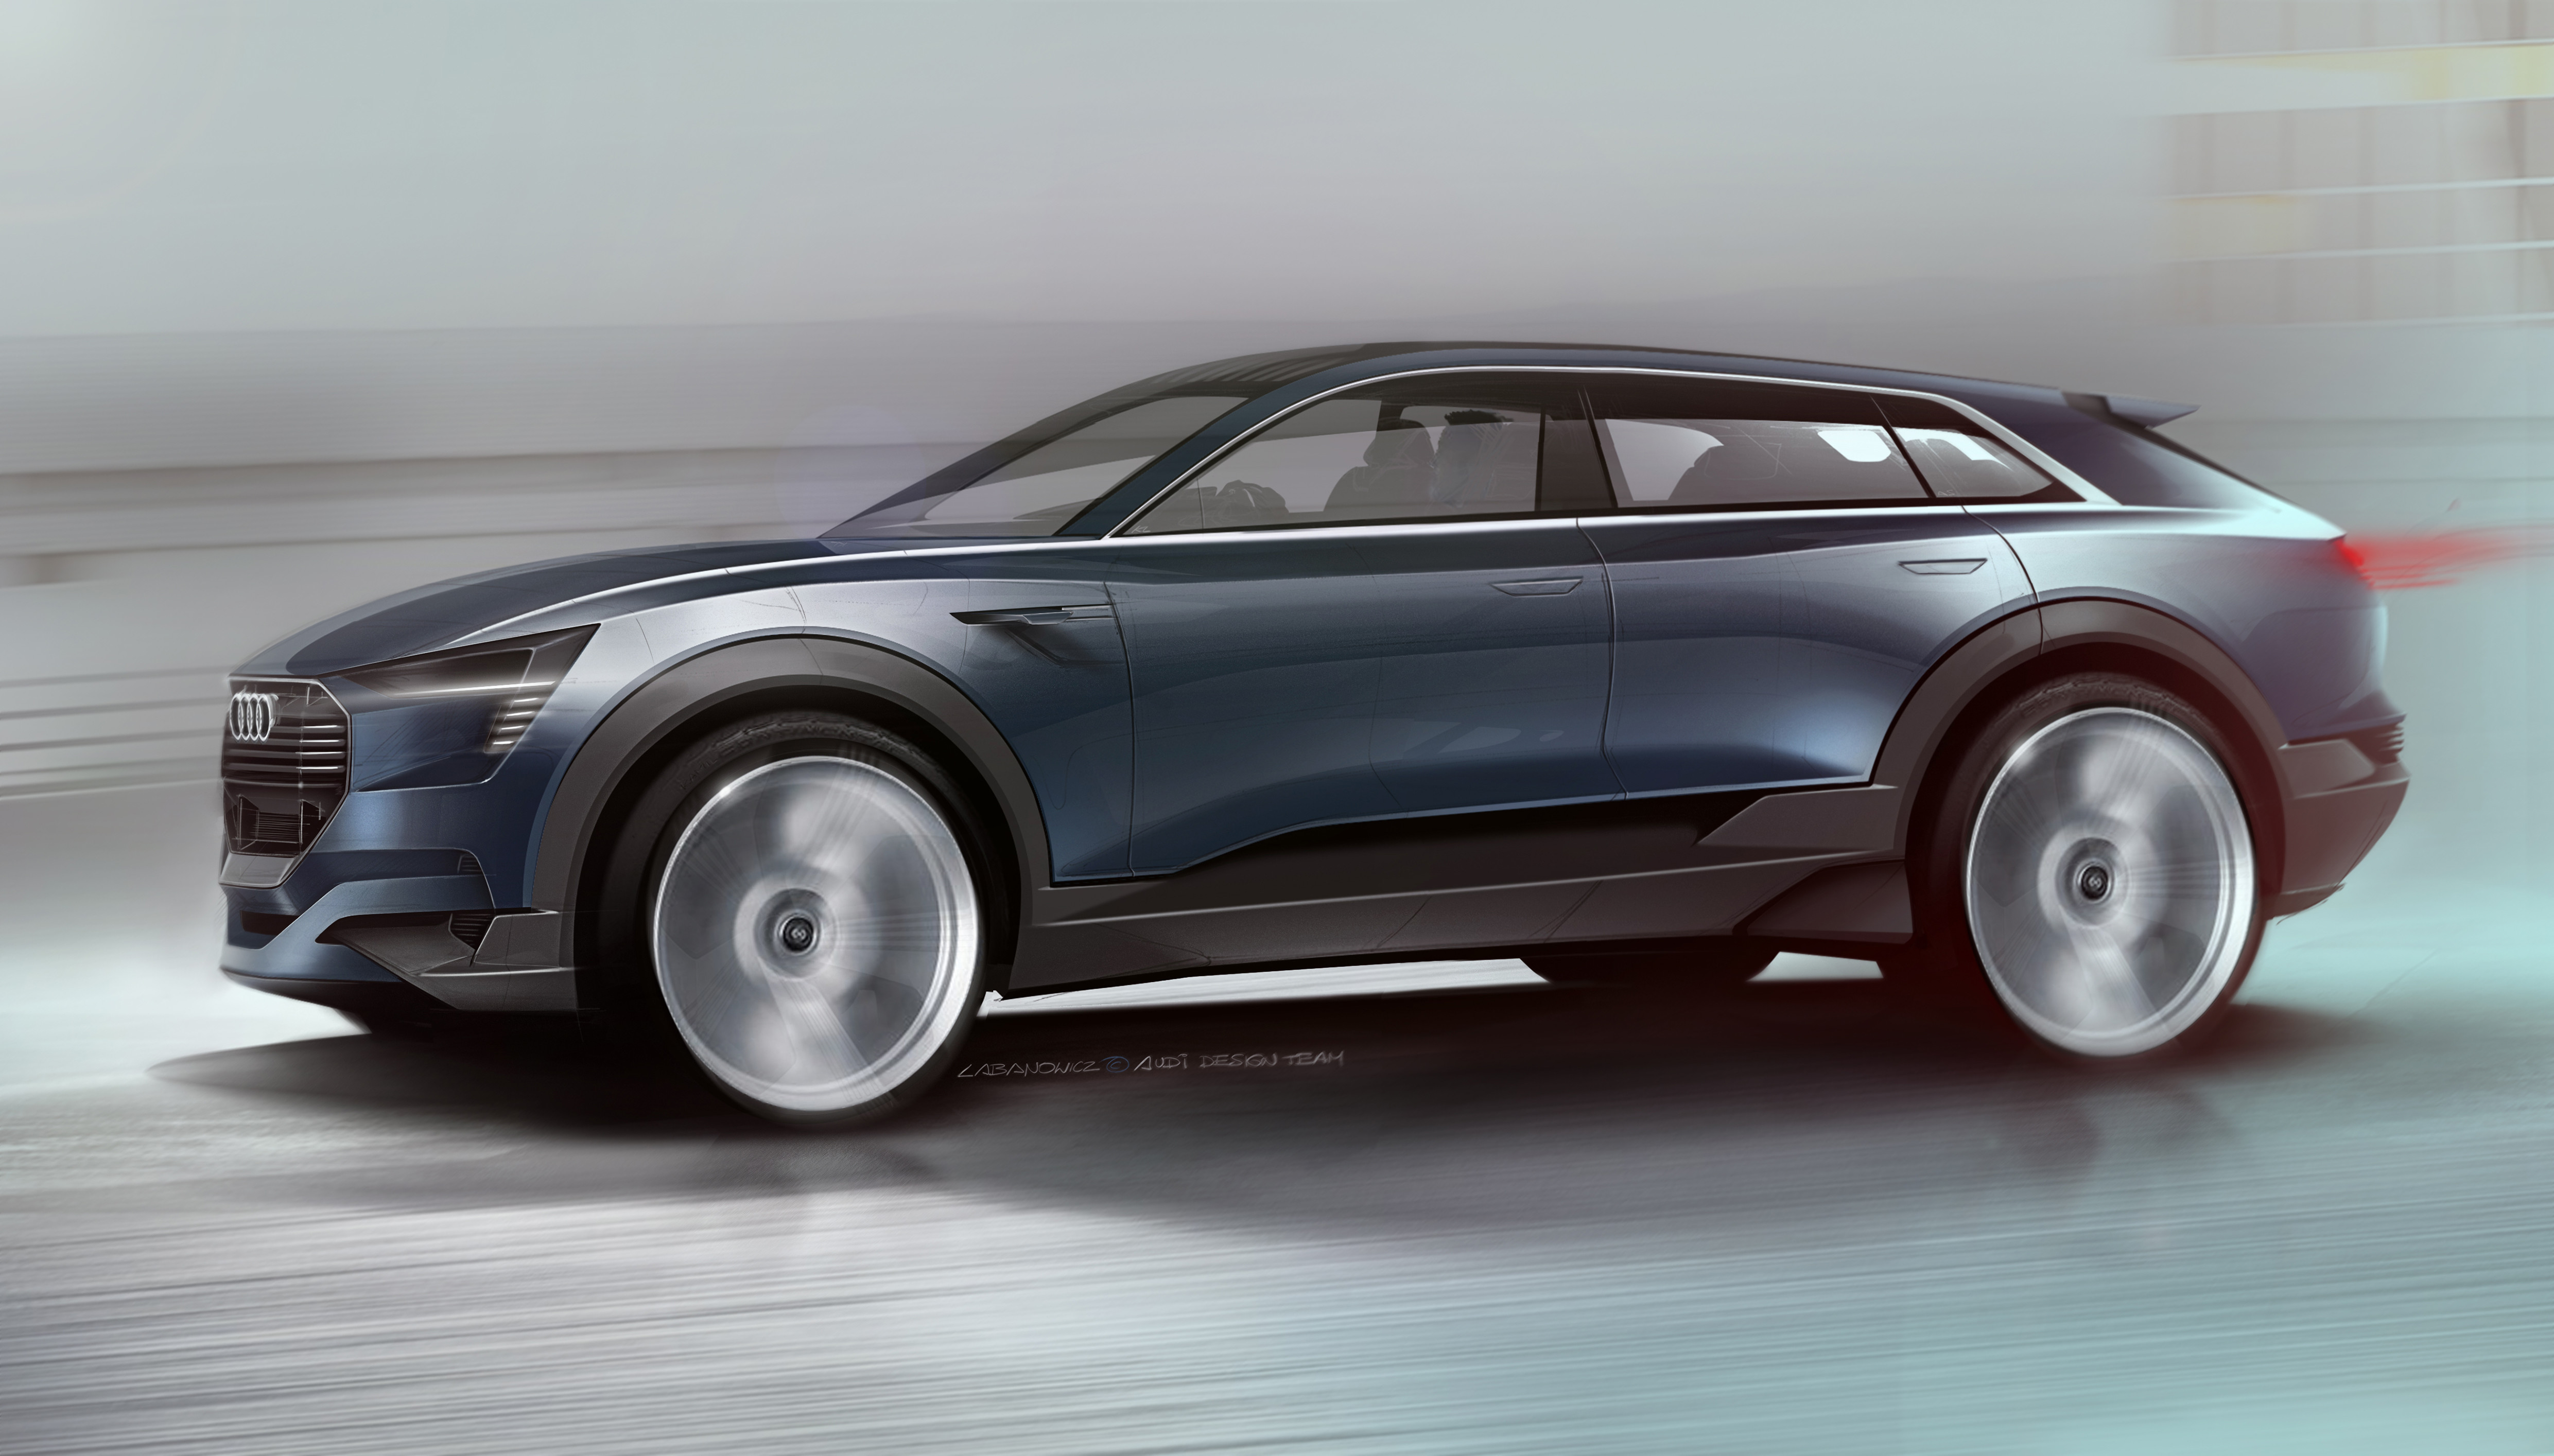 Audi e-tron quattro concept â?? Exterior Sketch